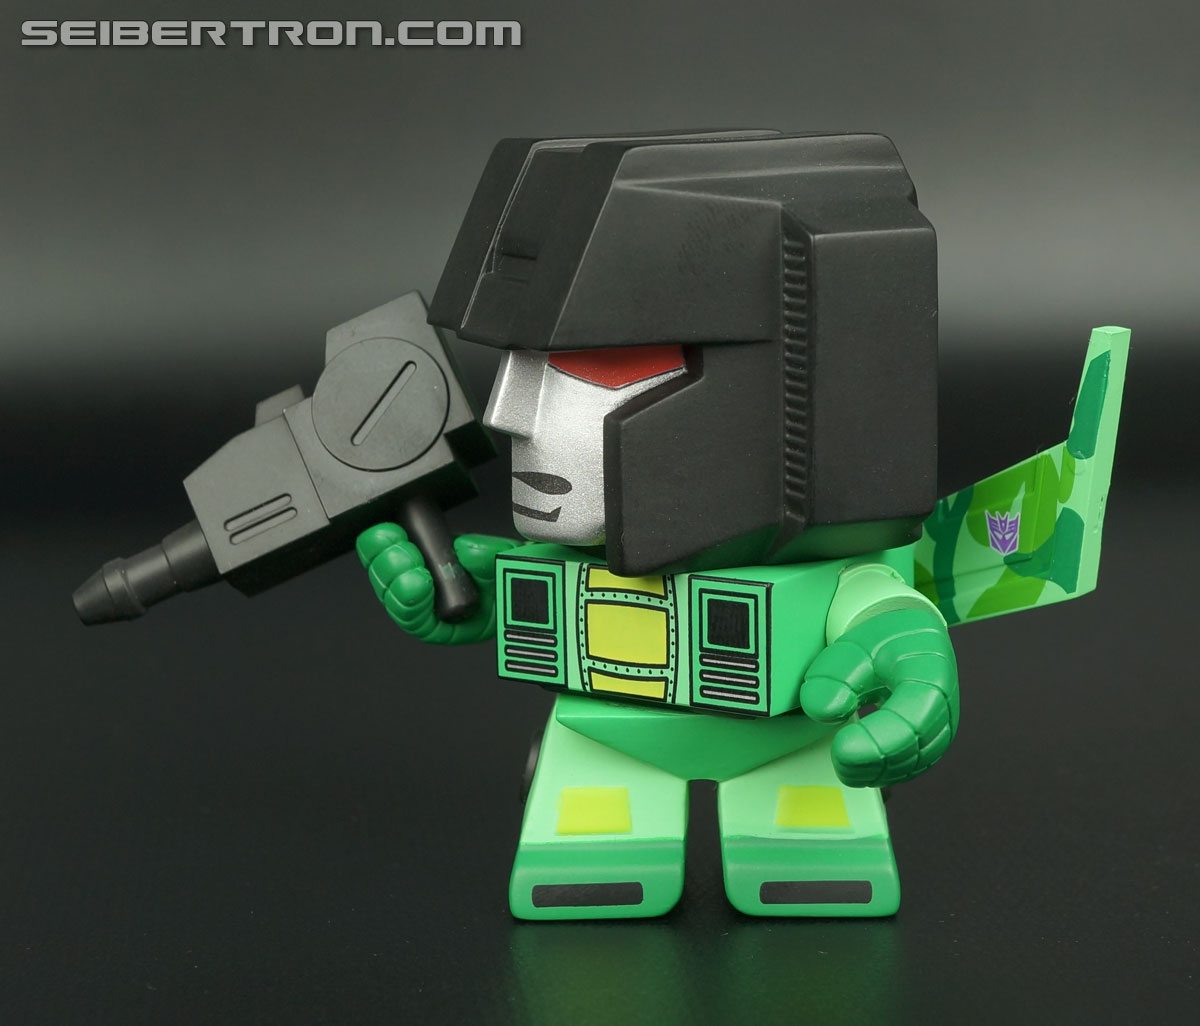 Transformers Loyal Subjects Rainmaker (Green) (Acid Storm) (Image #30 of 40)